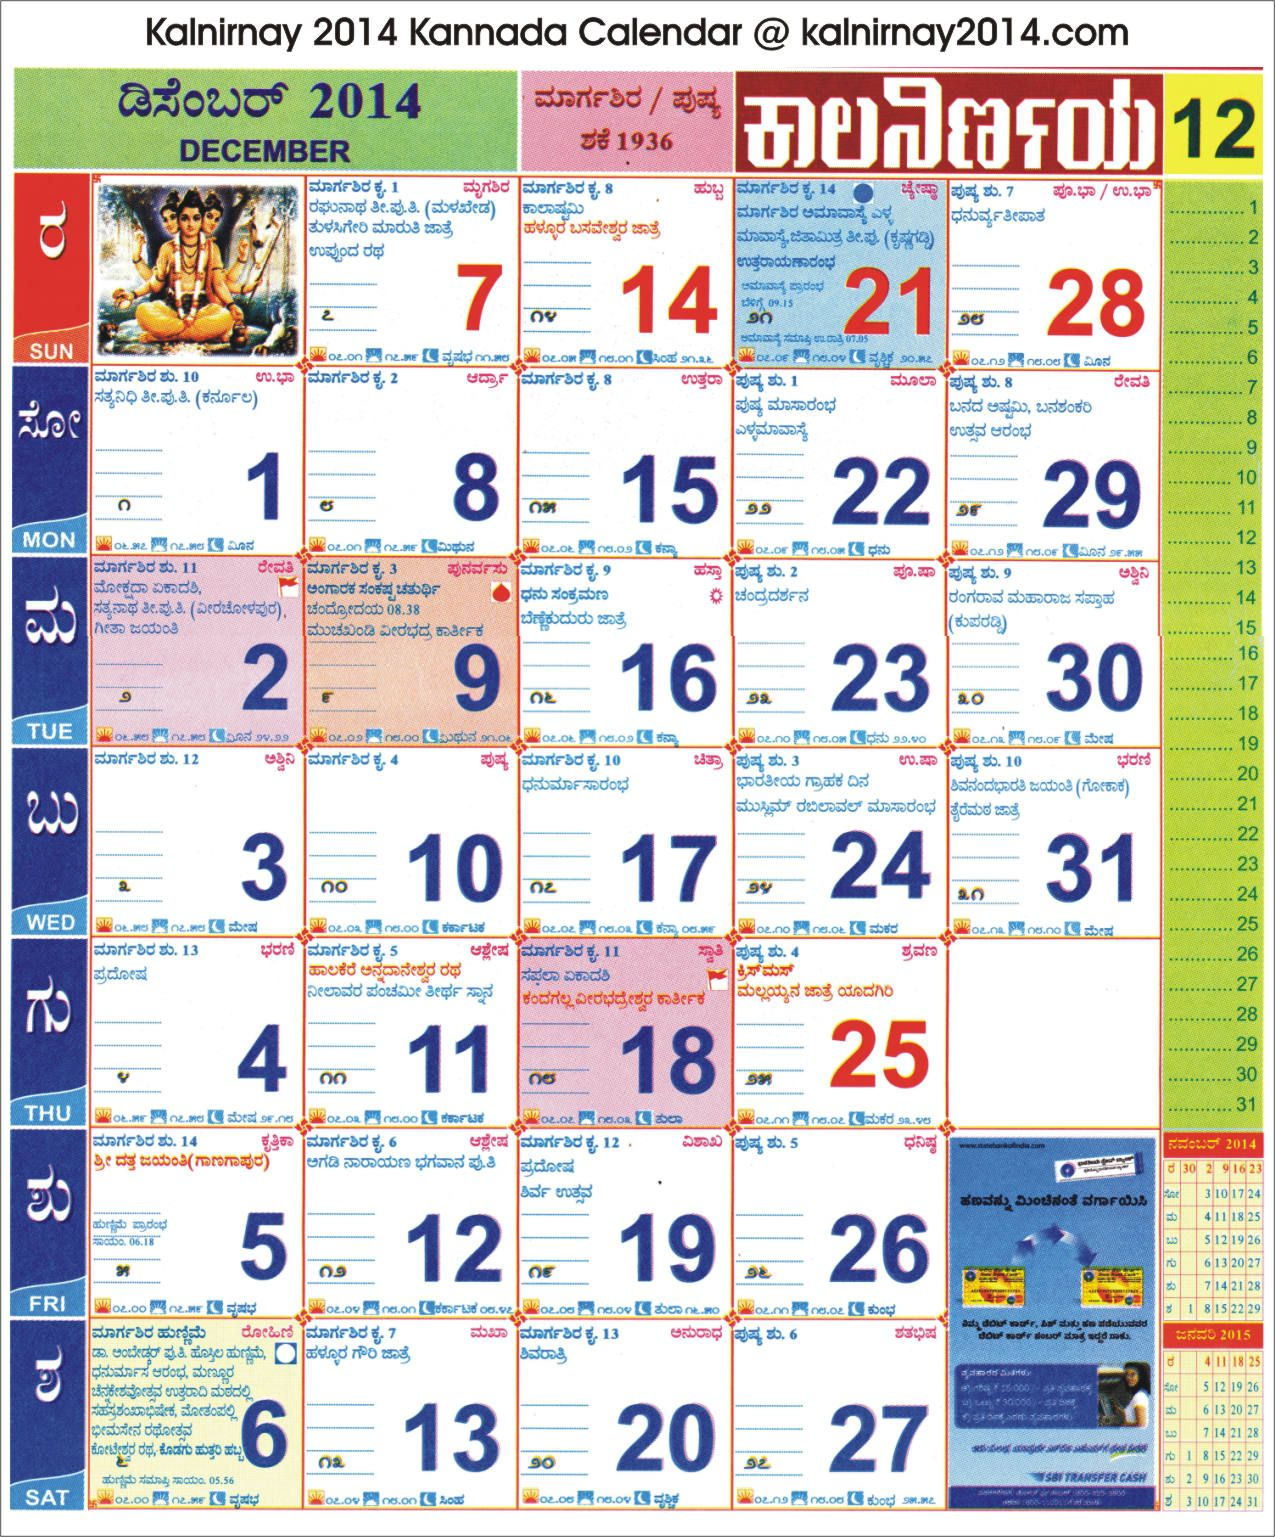 Kannada Calendar 2019 December December 2014 Kannada kalnirnay Calendar | 2014 Kannada Kalnirnay